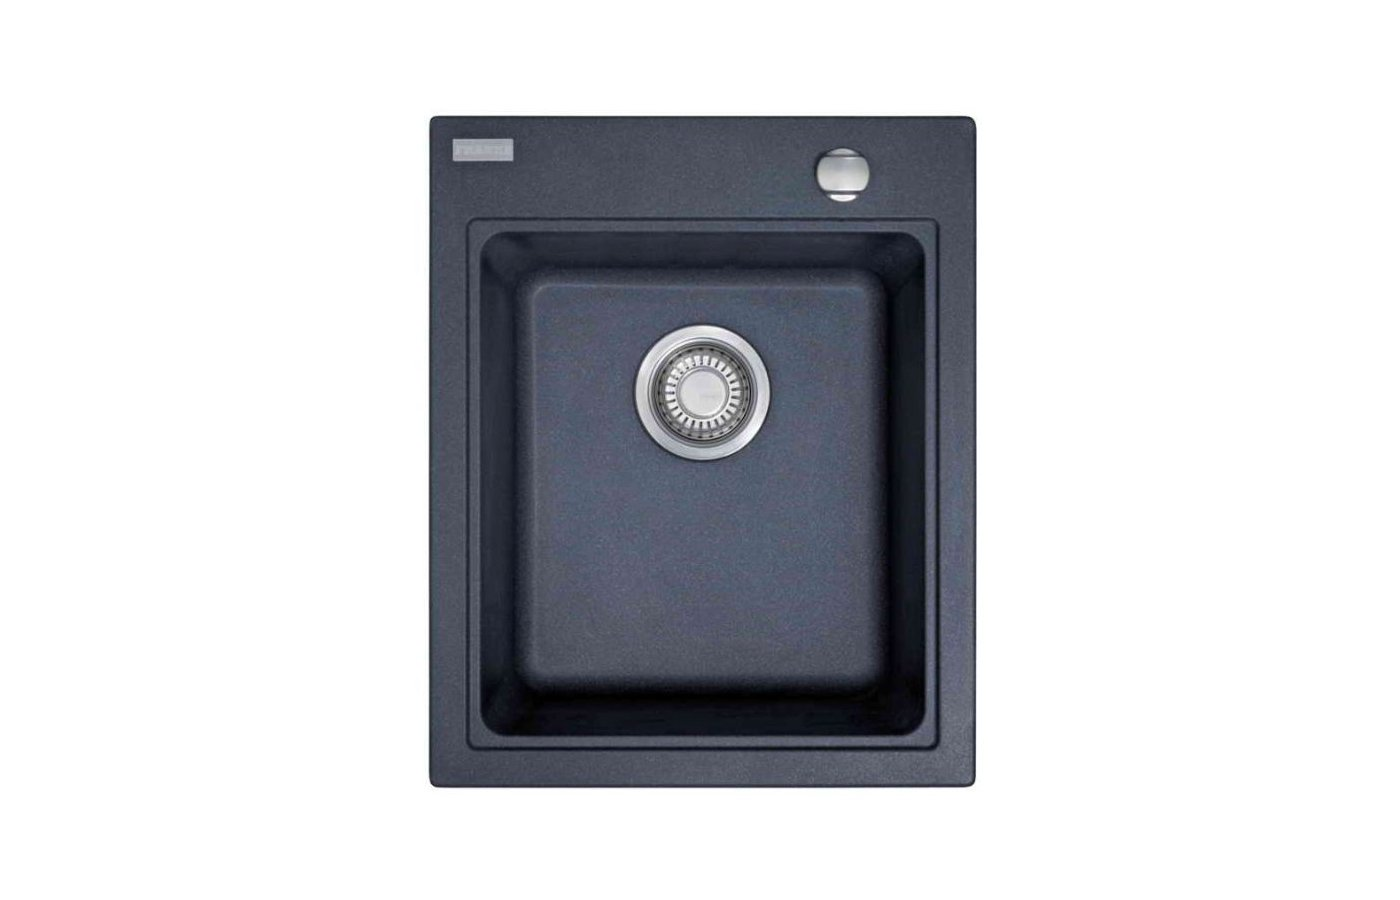 Кухонная мойка FRANKE MRG 610-42 графит